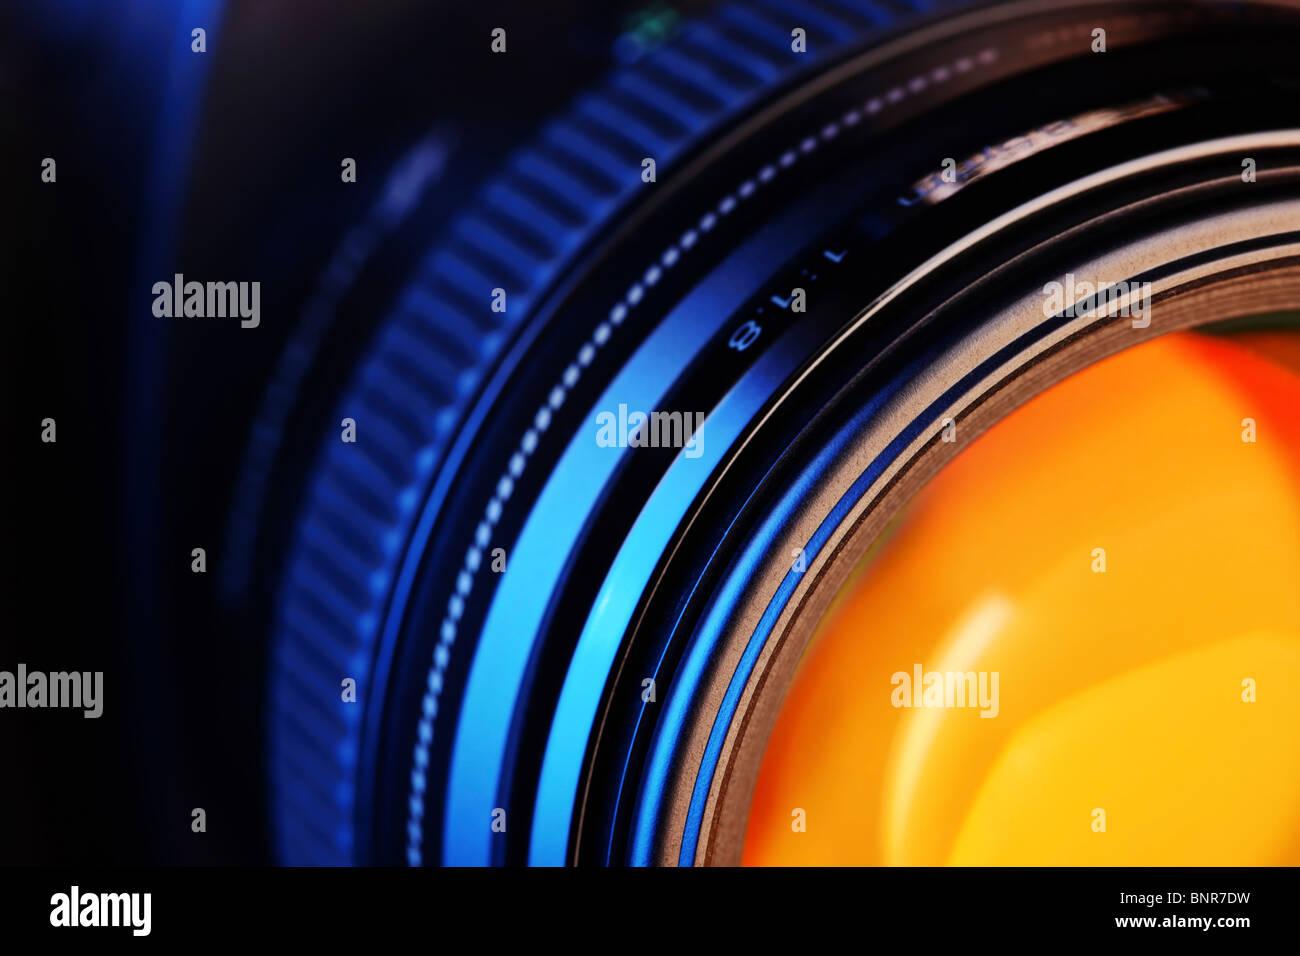 Close-up de una cámara-lente acoplada a una moderna cámara digital Imagen De Stock